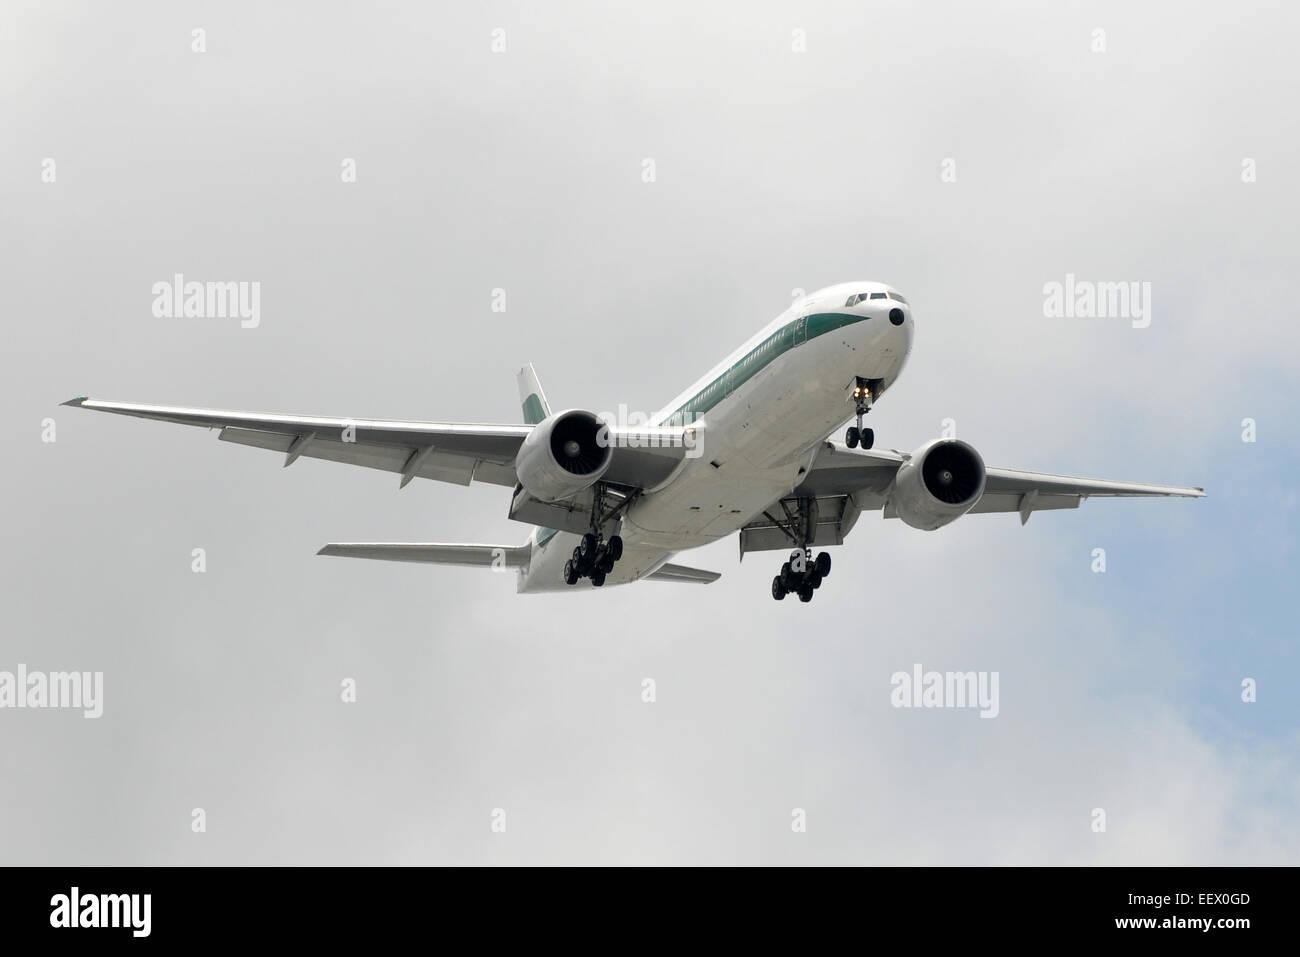 Modern passenger jet airplane approaching for landing Boeing 777 - Stock Image